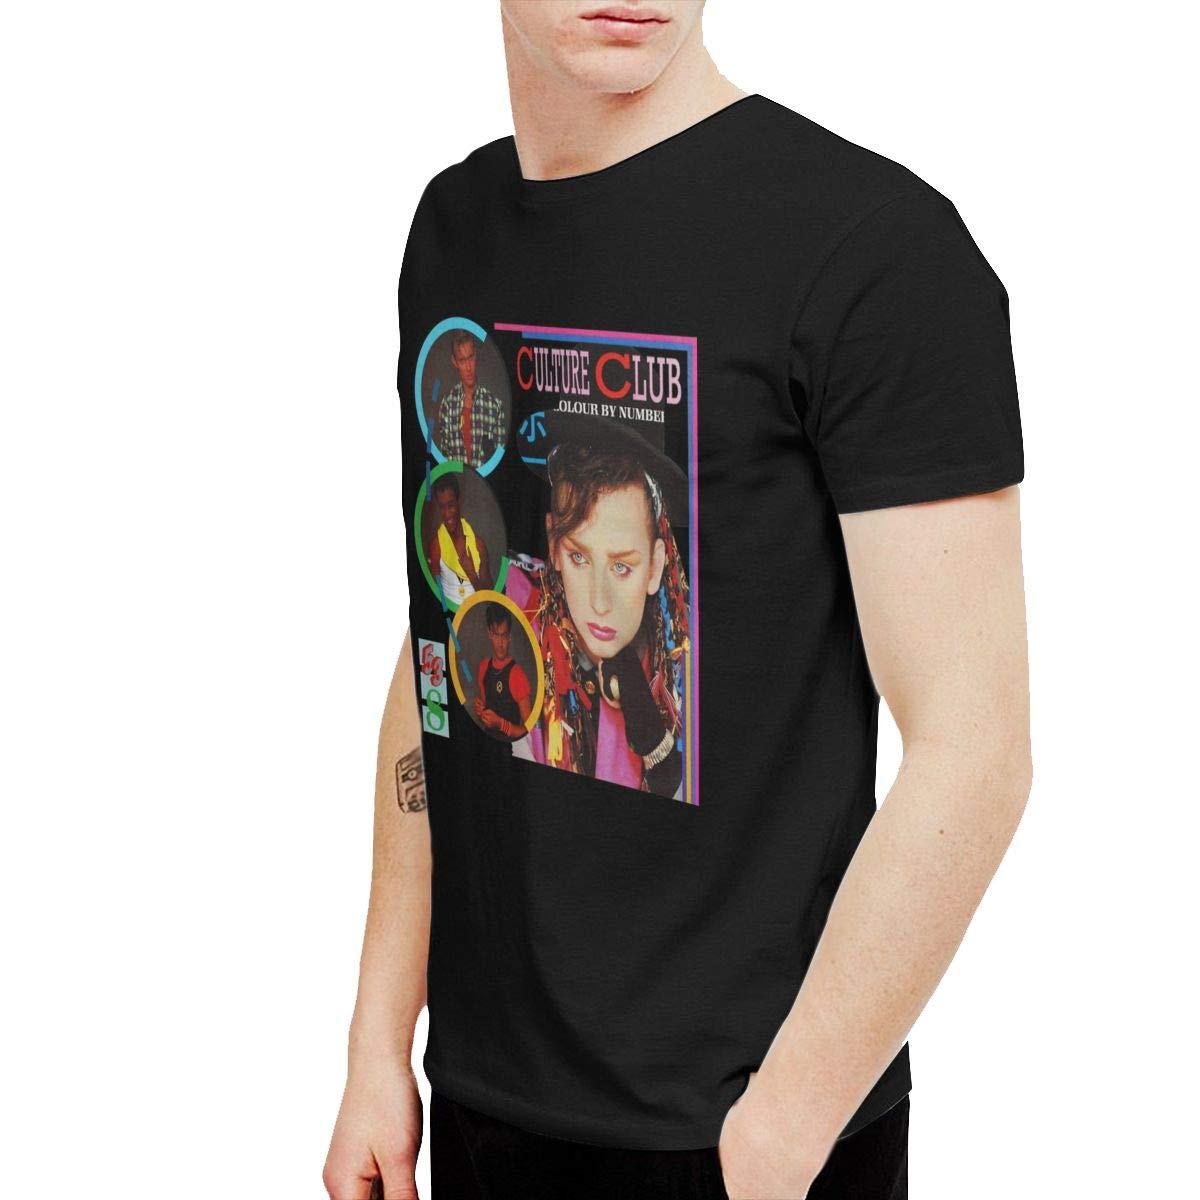 XLBSFJIWVD Culture Club Colour by Numbers Mens Short Sleeve T-Shirt Black